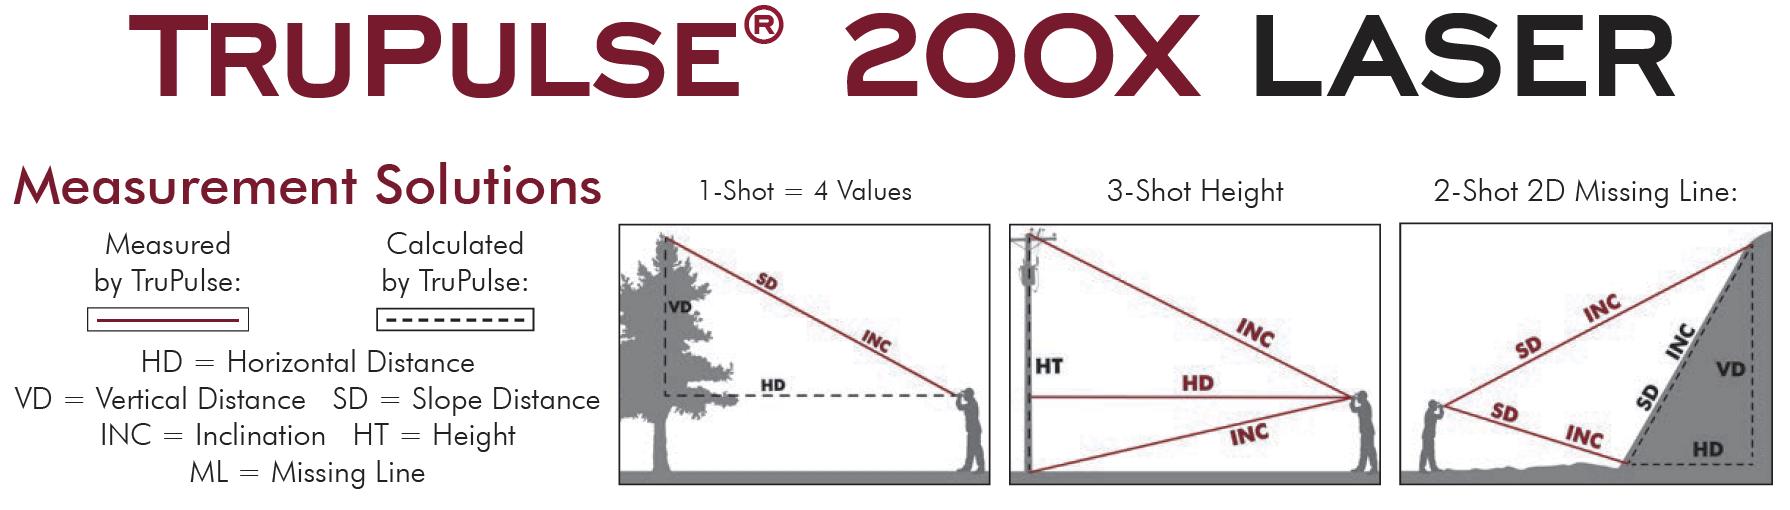 Measurements-200x